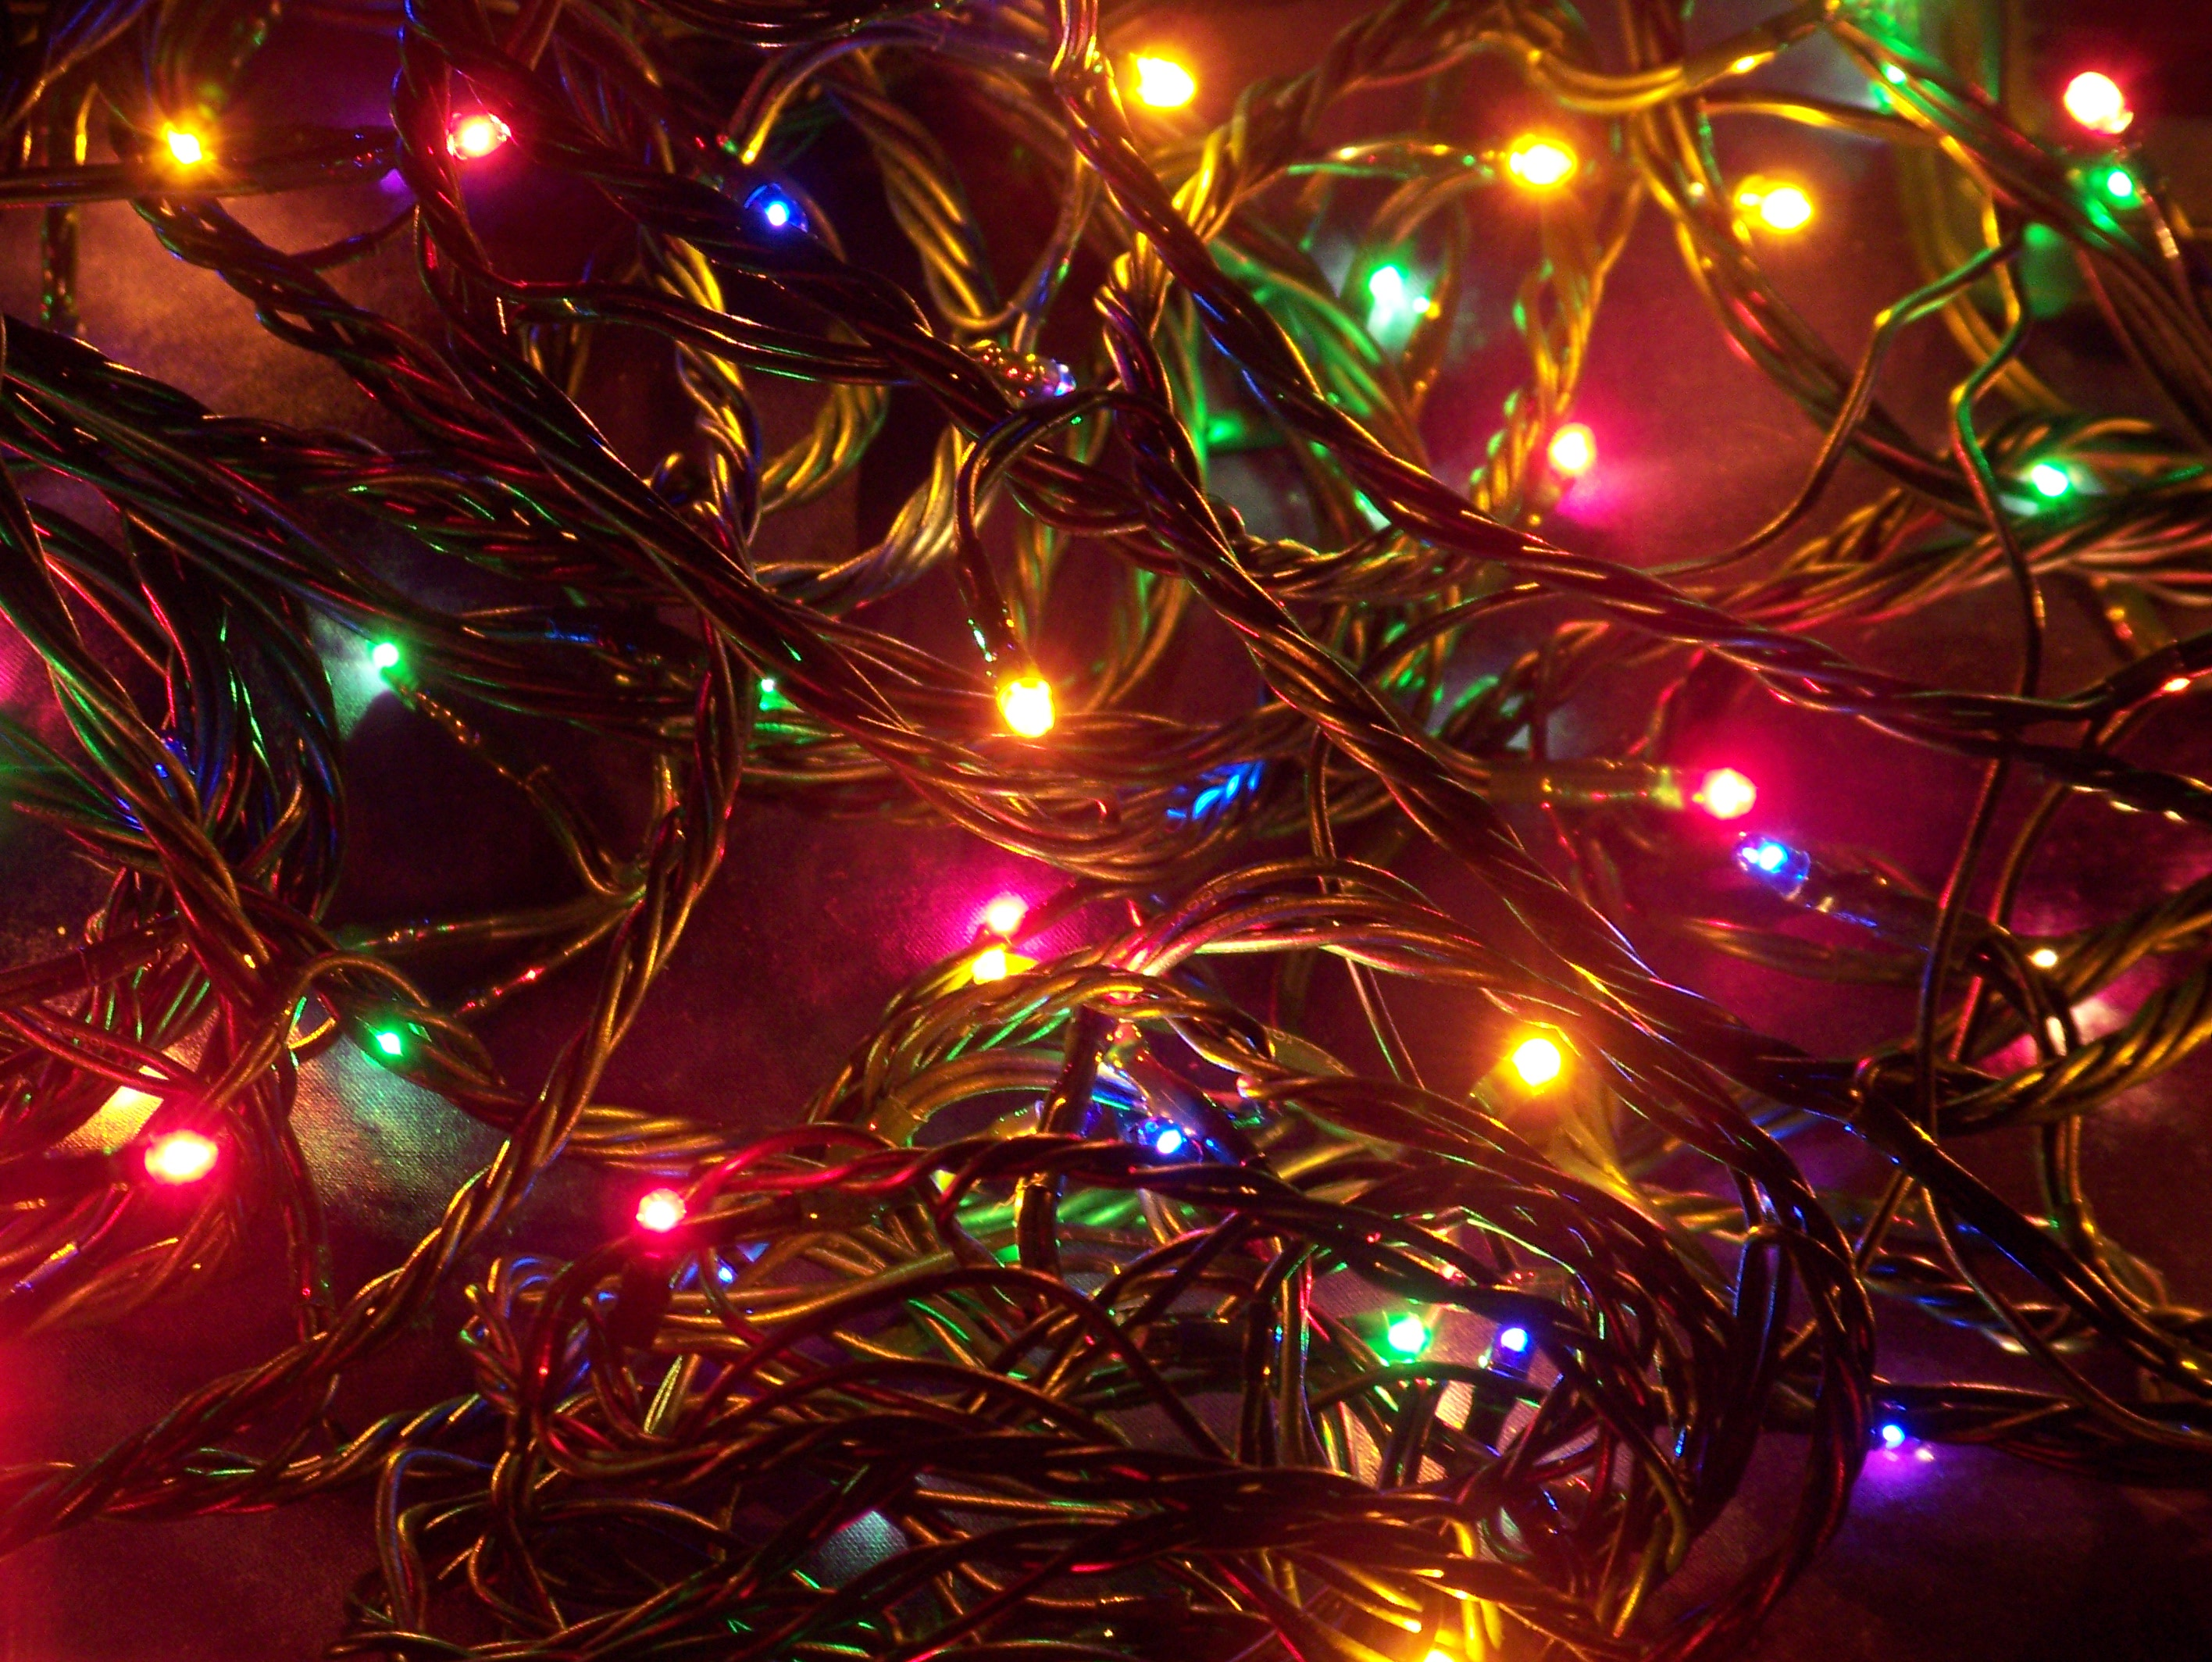 New Christmas Lights Wallpaper , Christian Background